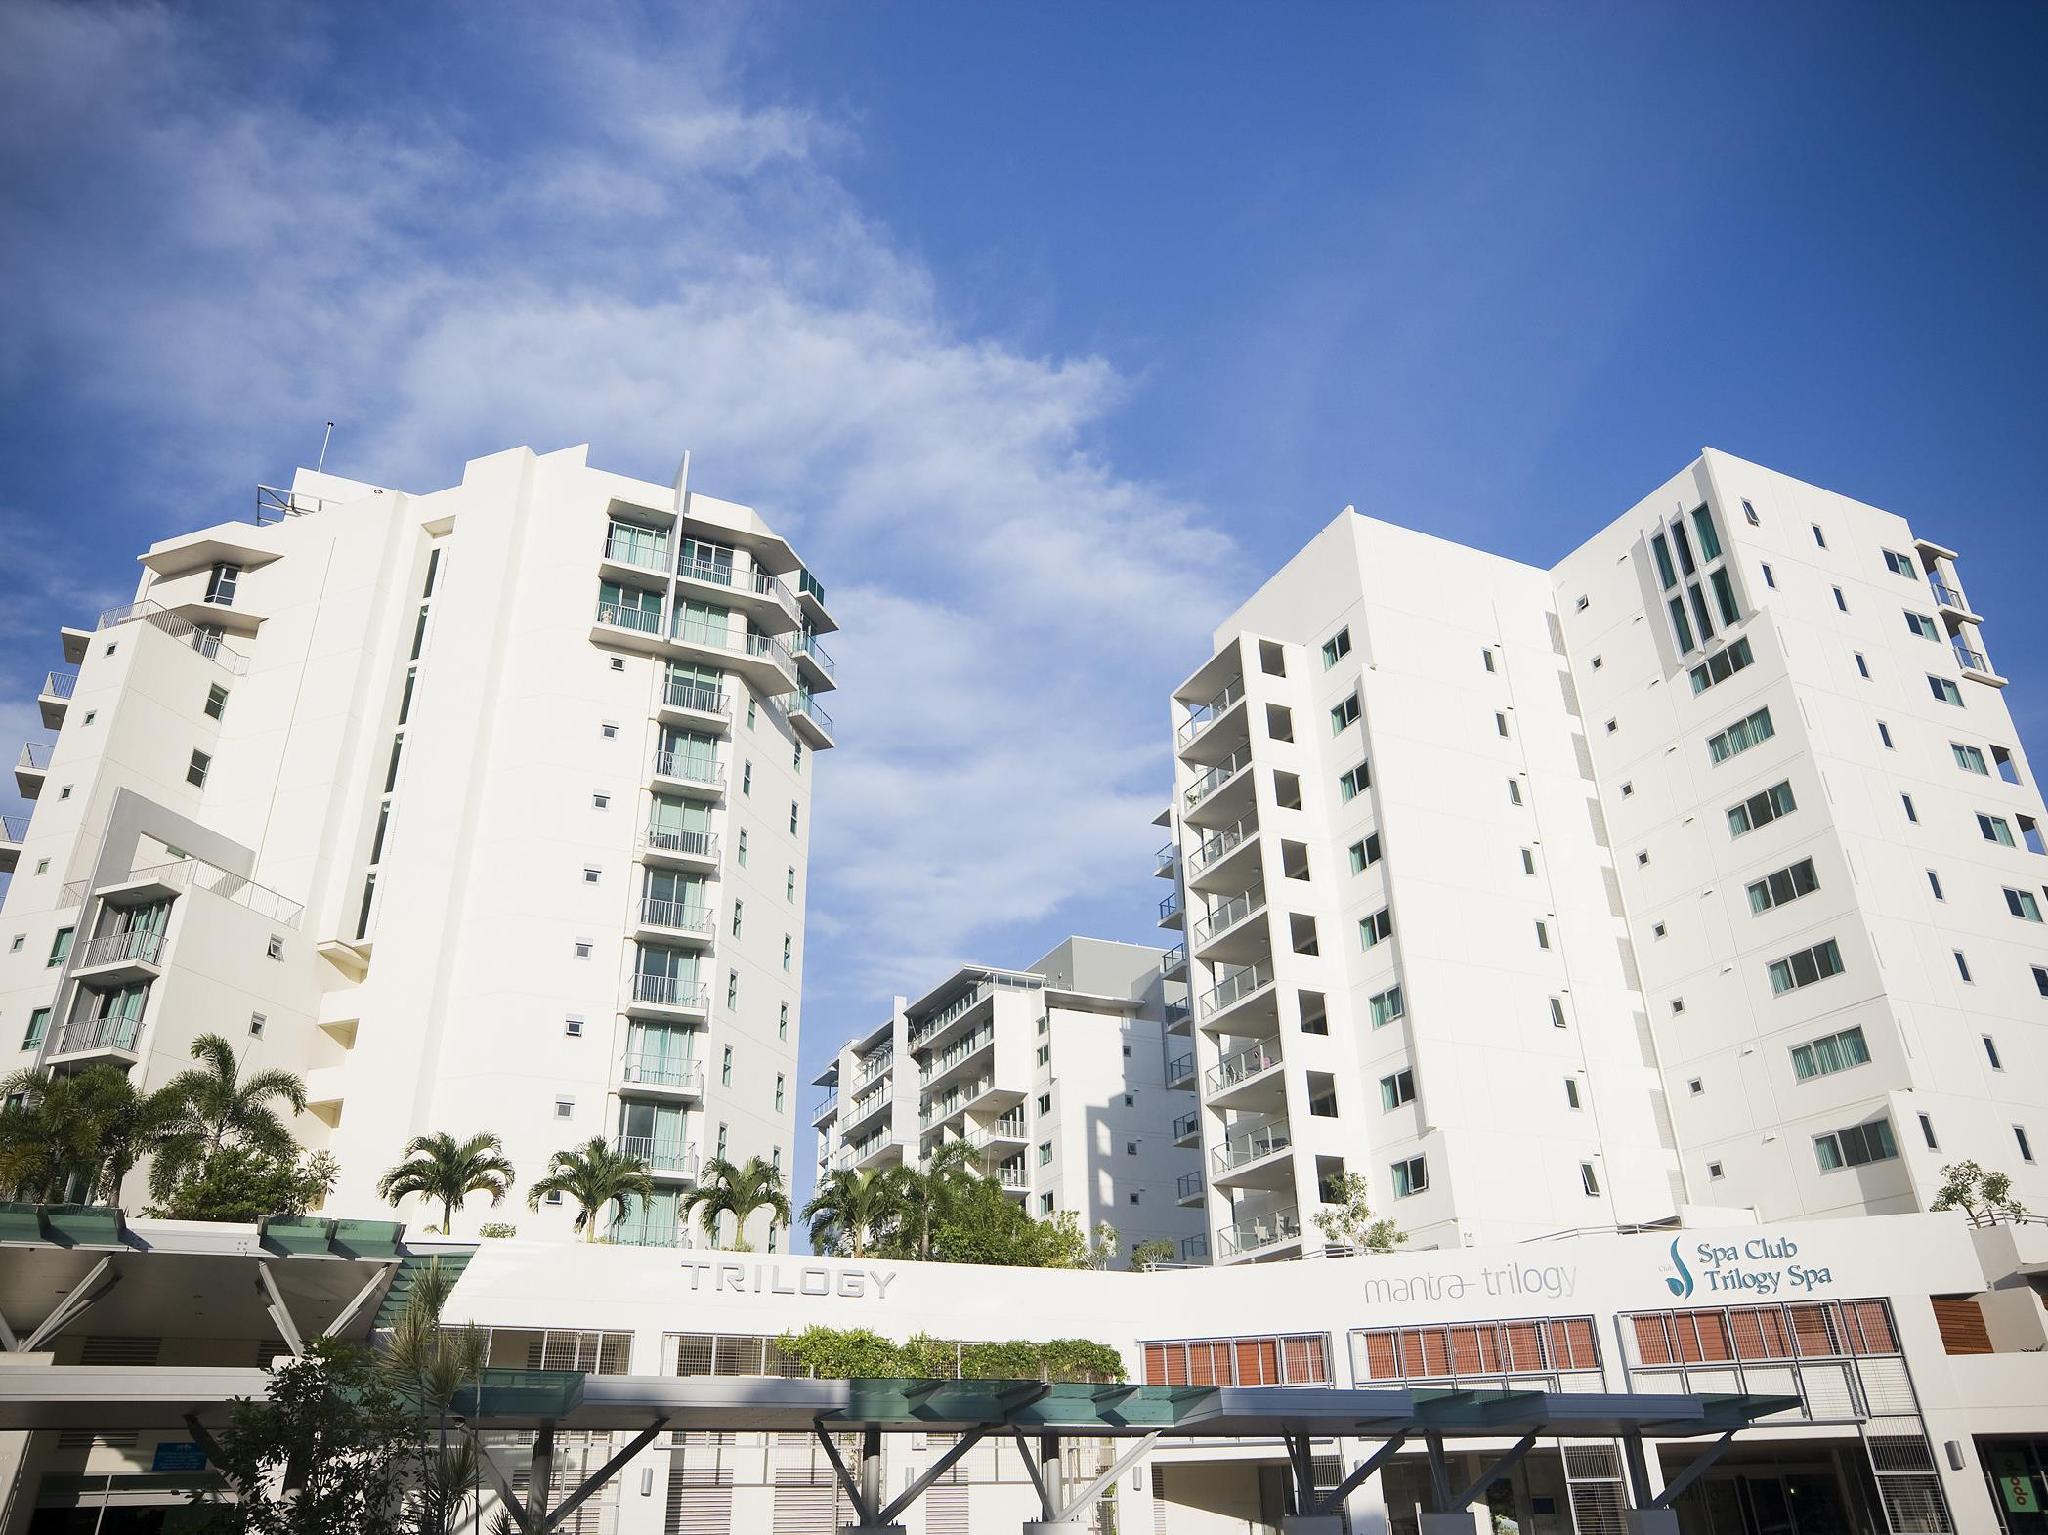 Mantra Trilogy Hotel - Hotell och Boende i Australien , Cairns